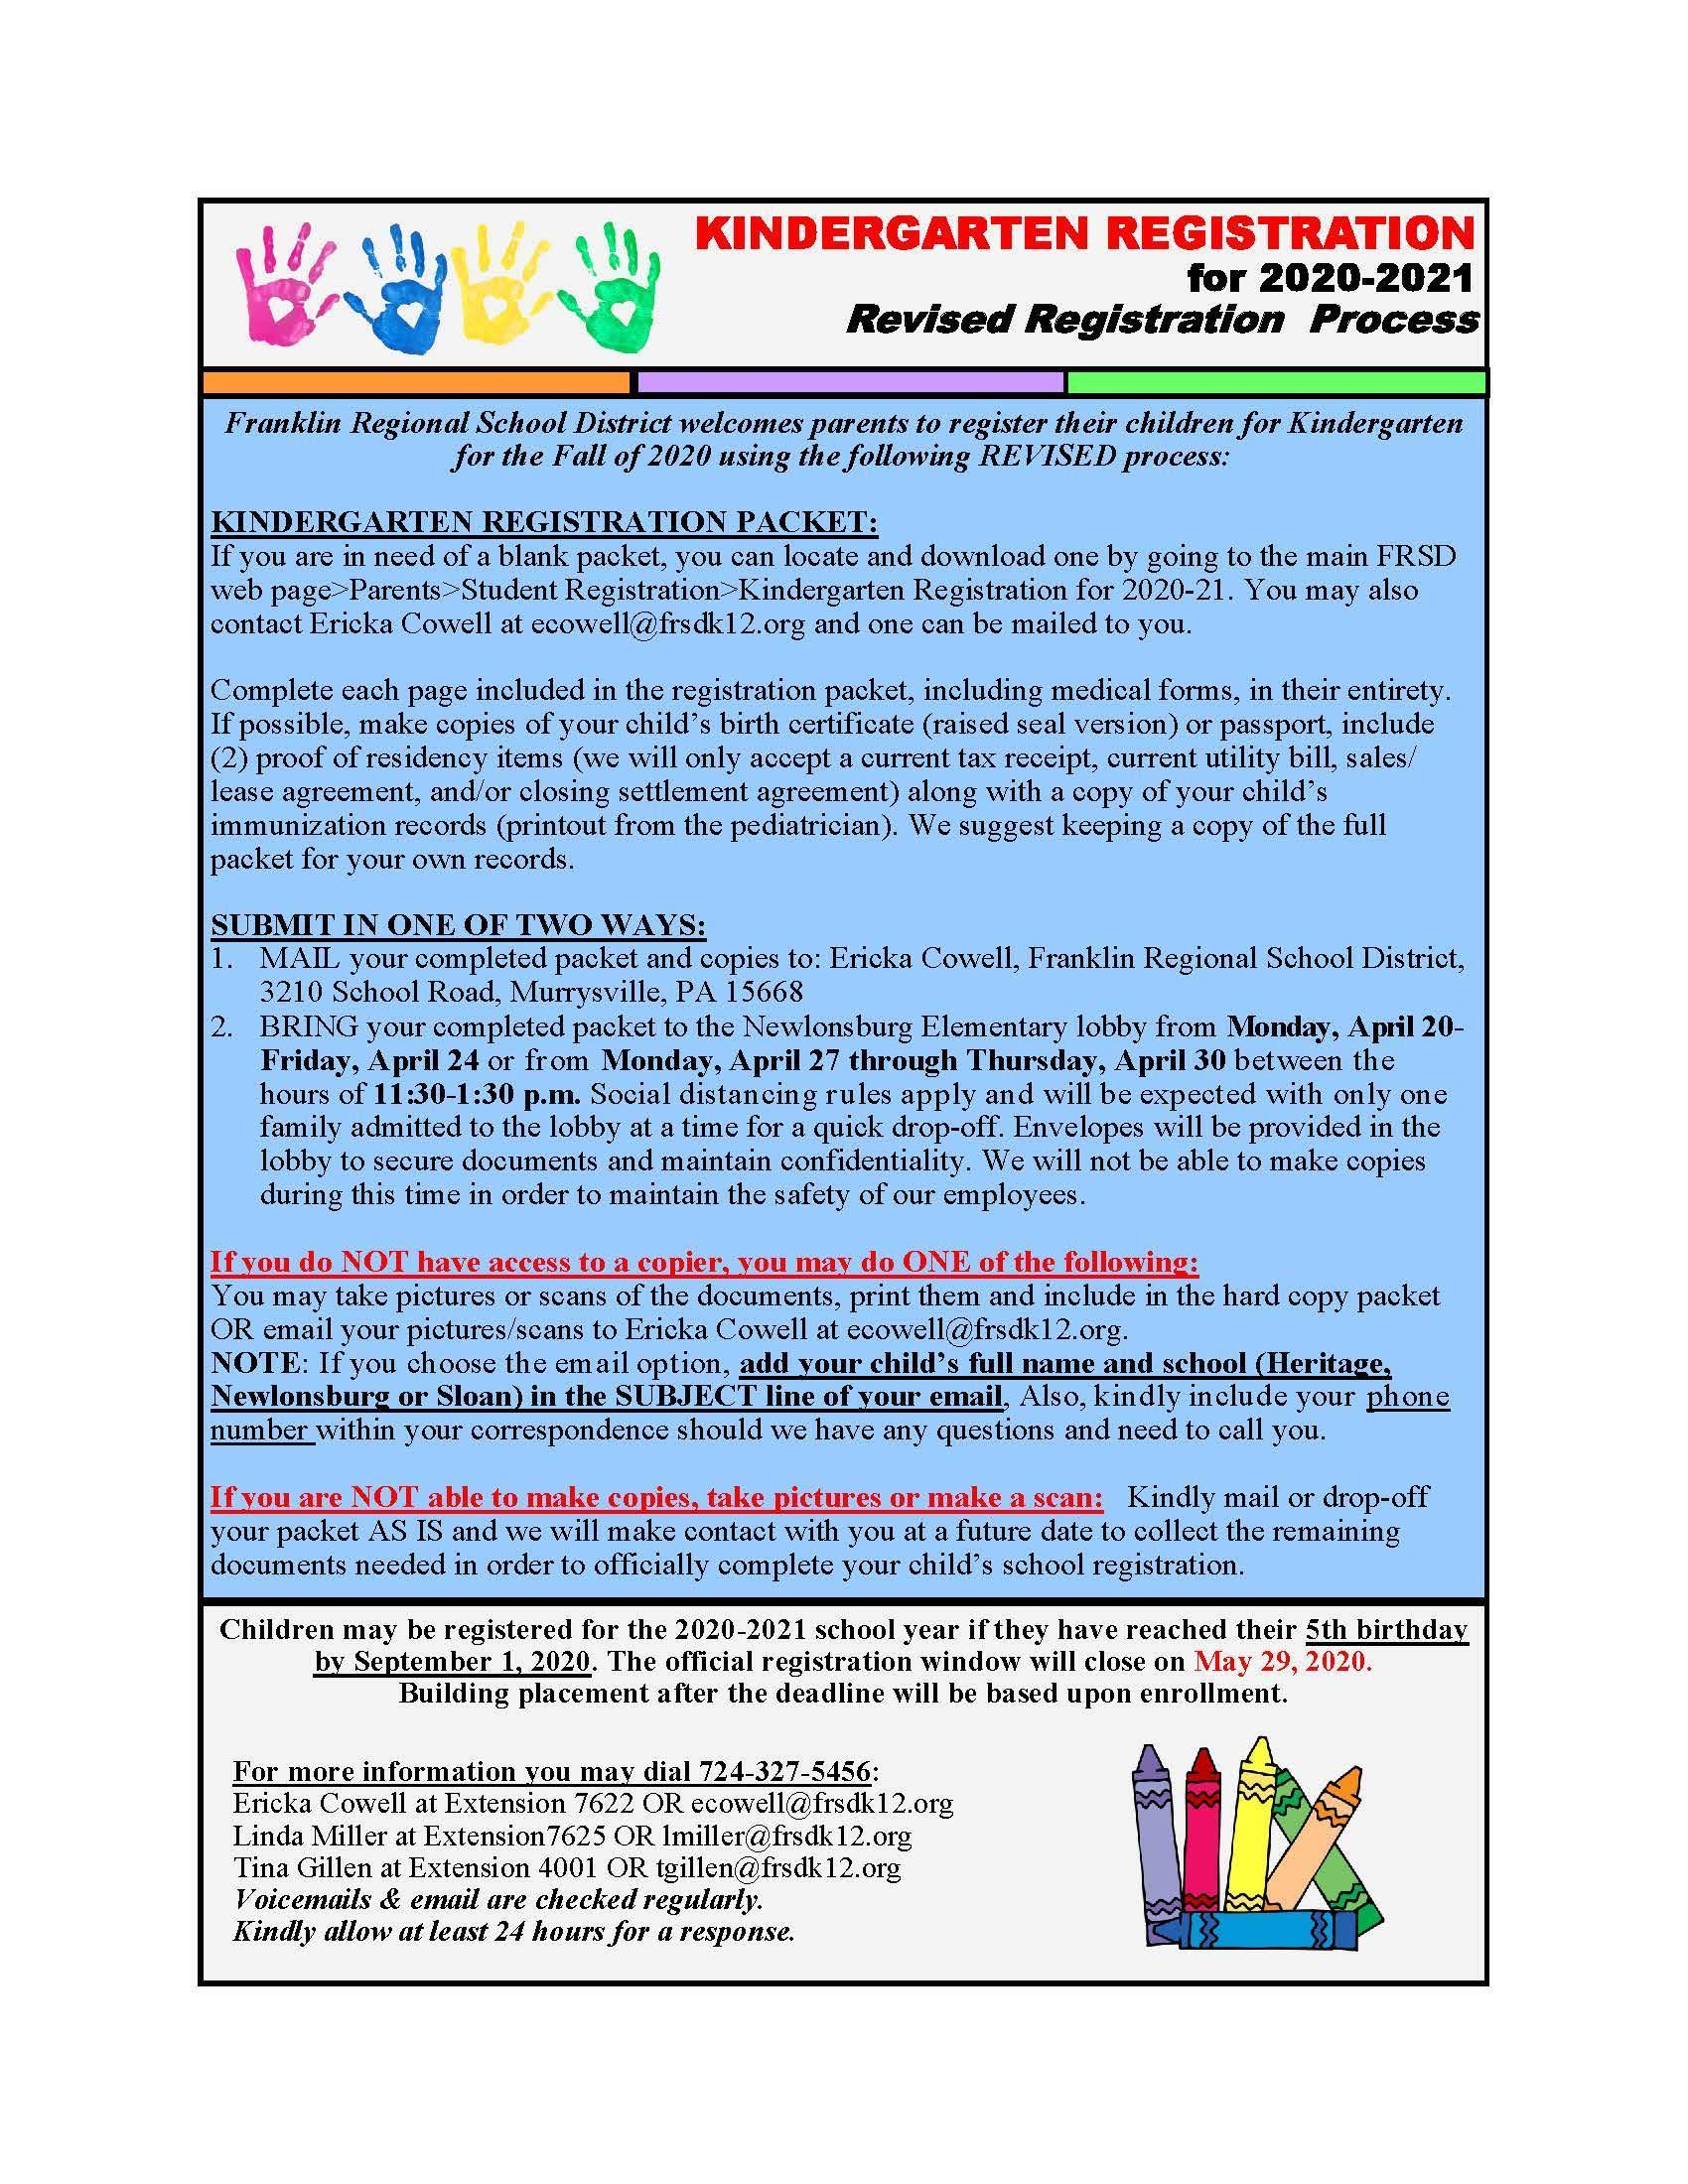 Kdg Reg Process 20-21